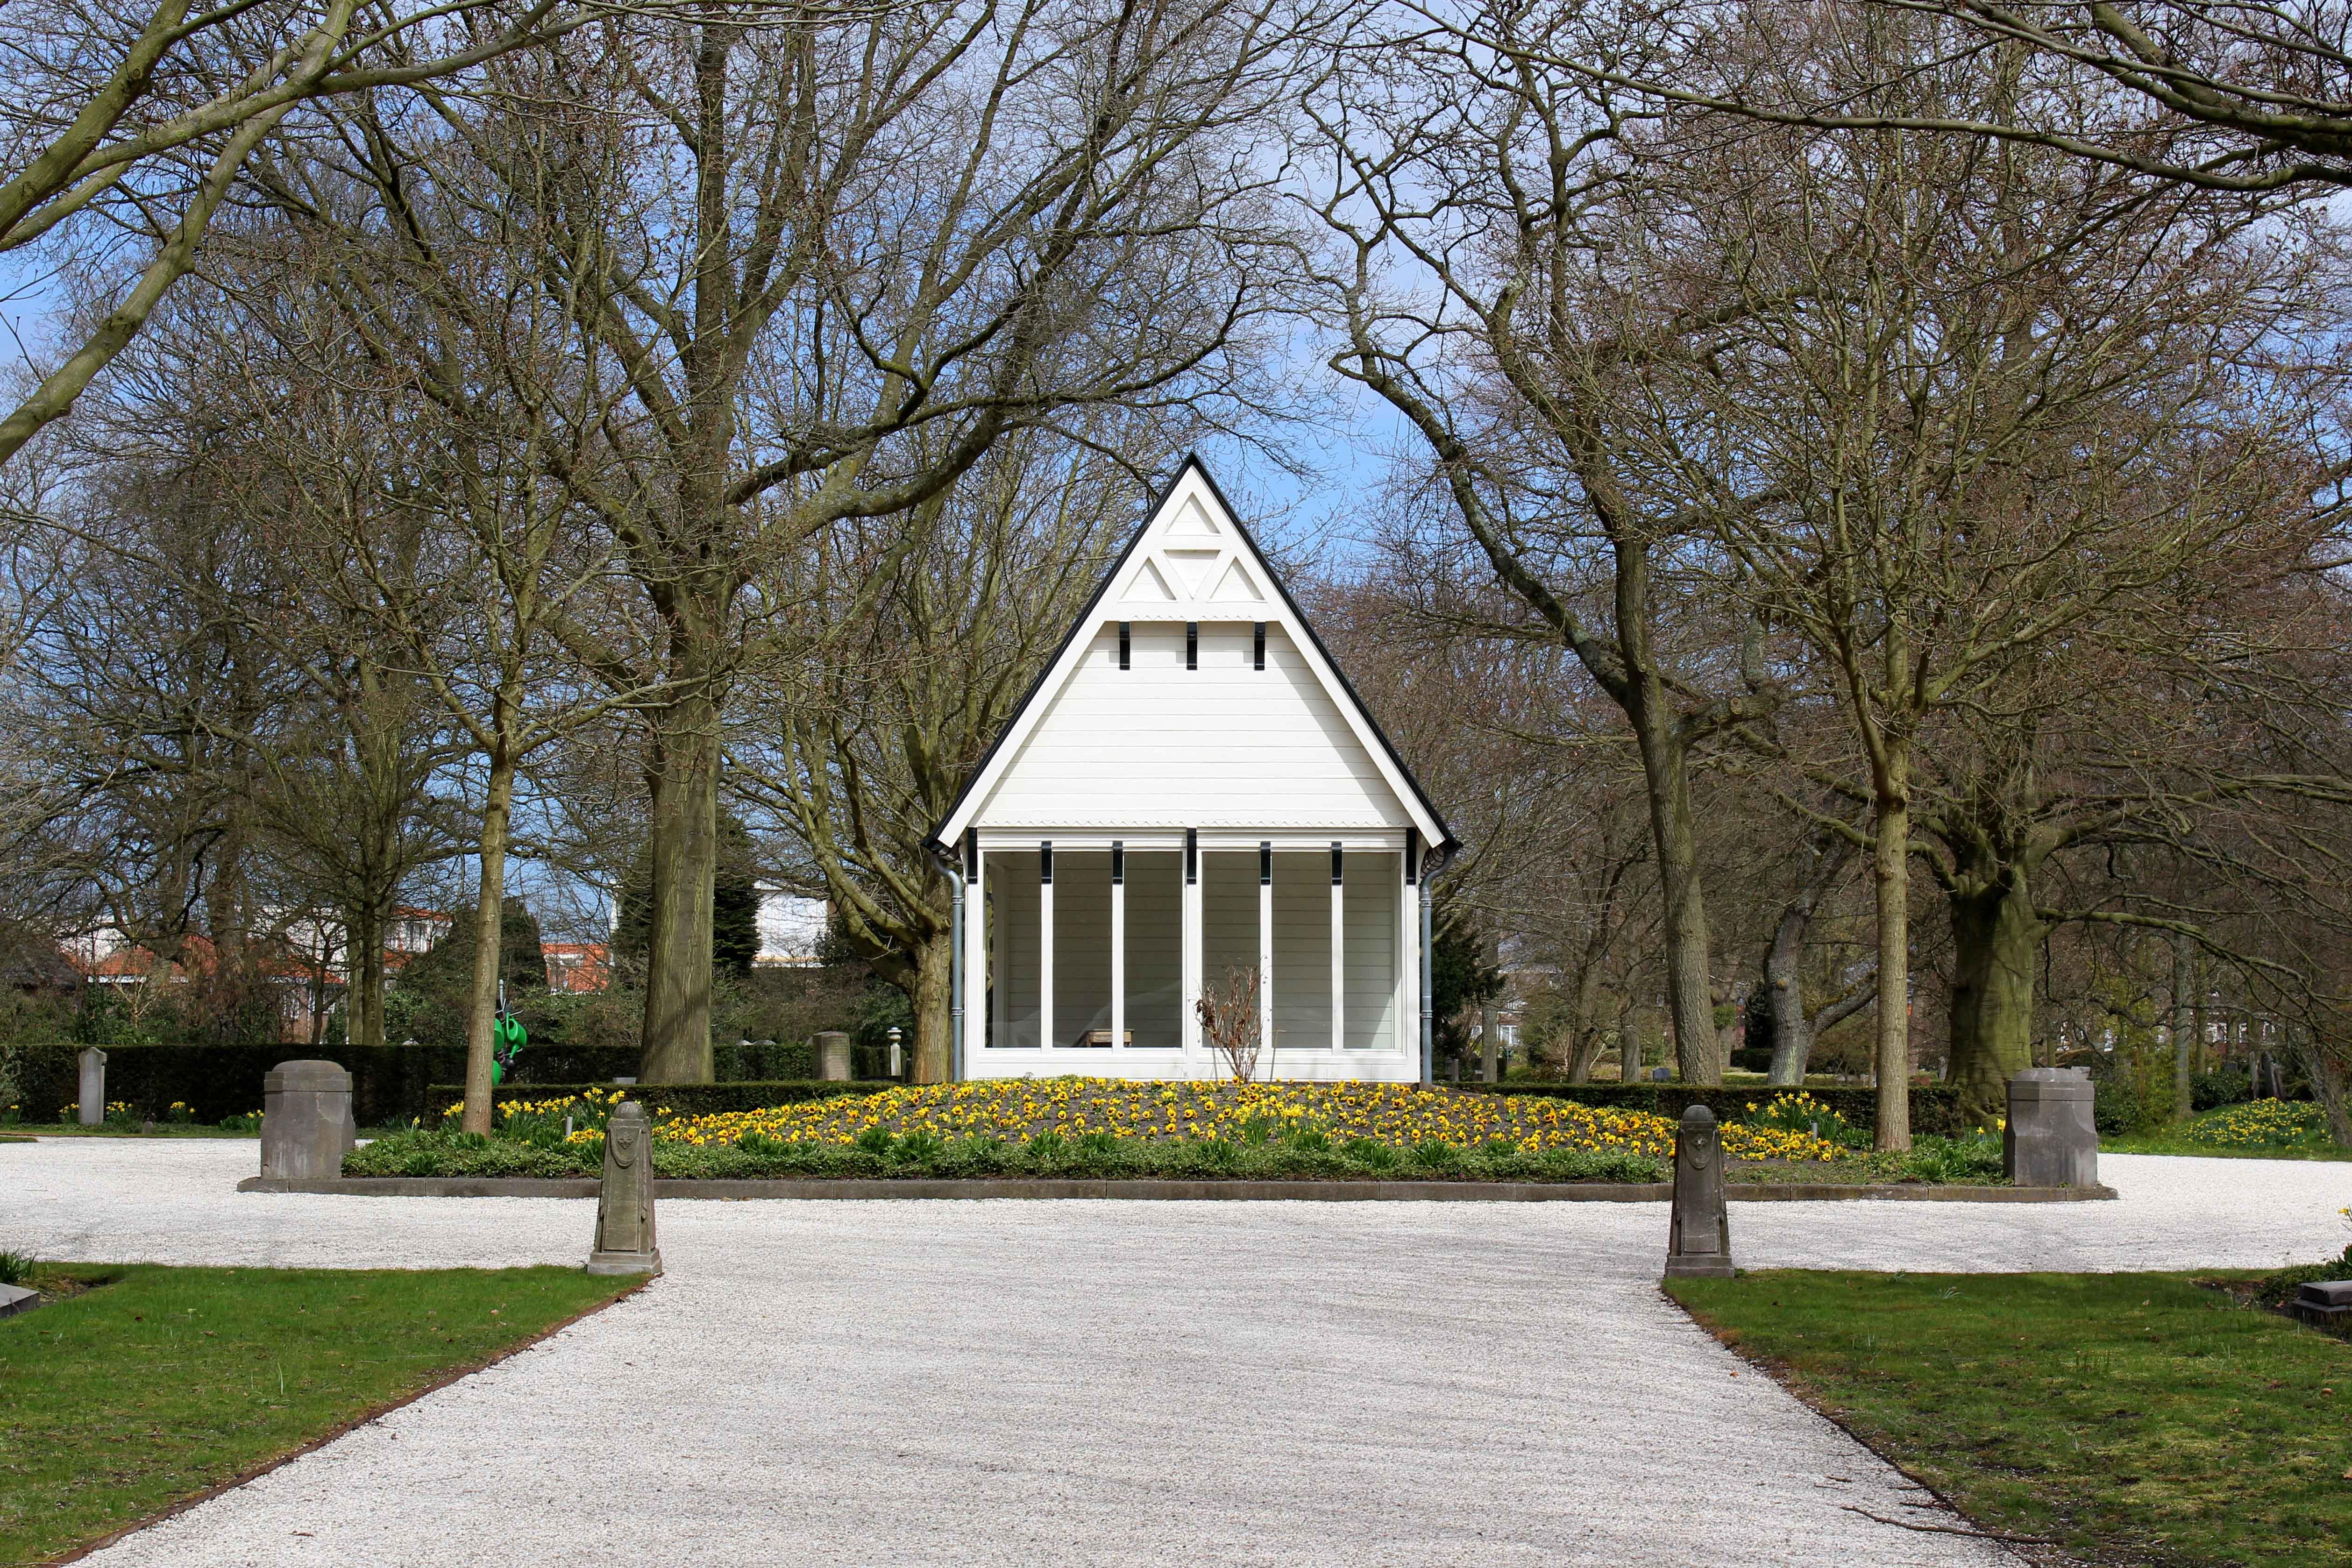 Kapel Begraafplaats Kleverlaan Haarlem